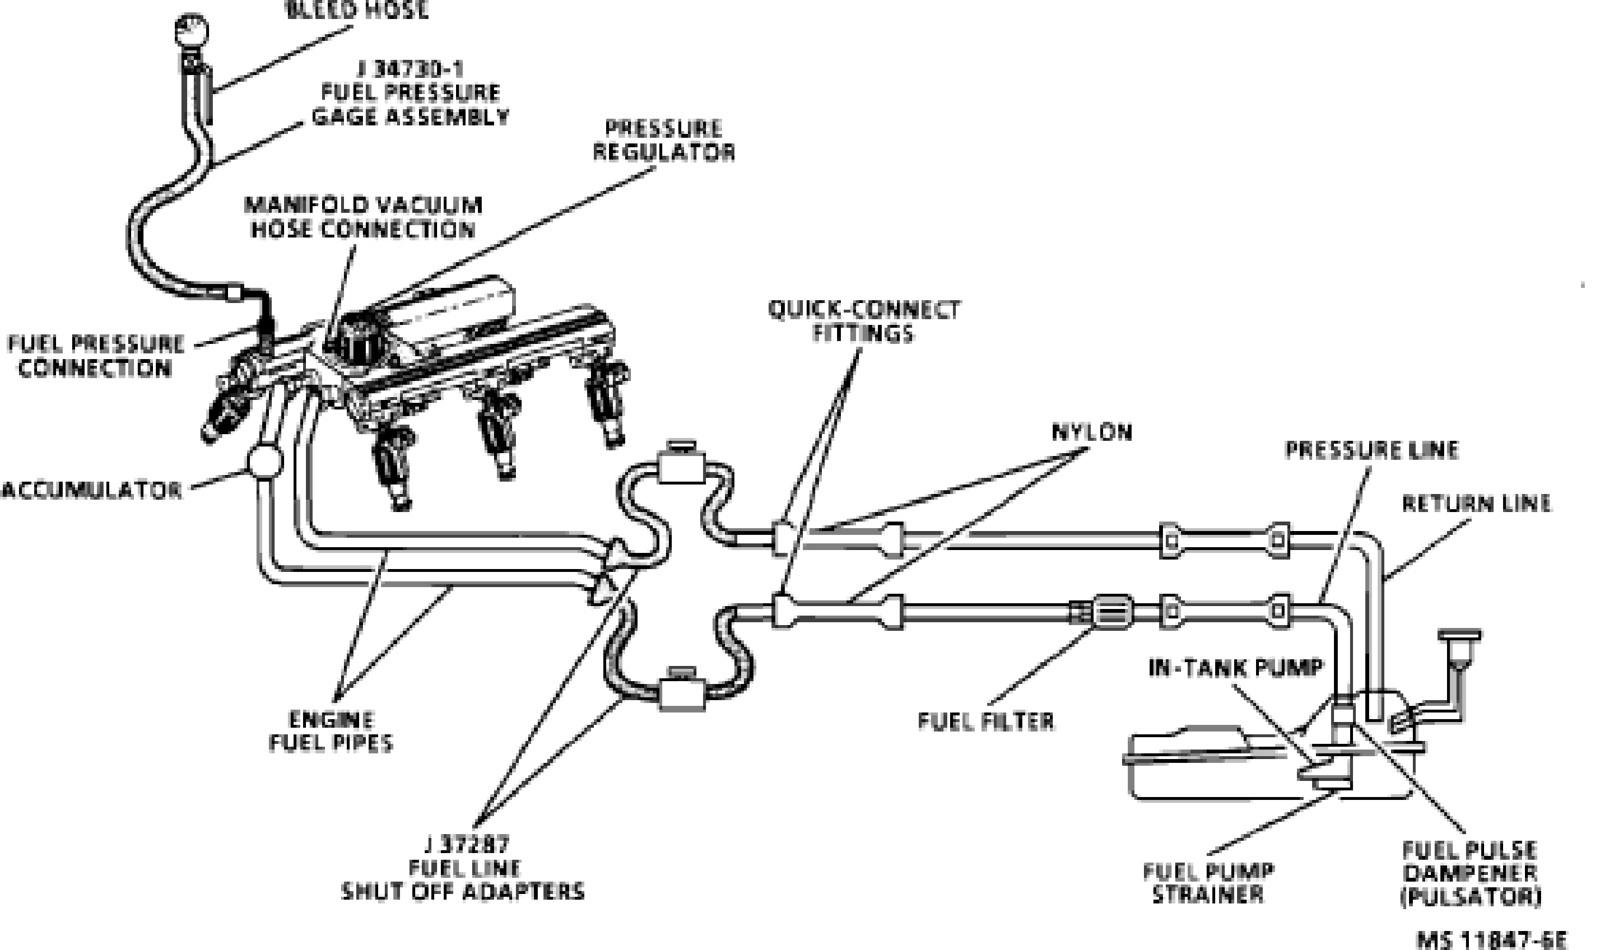 94 chevy fuel tank wiring diagram